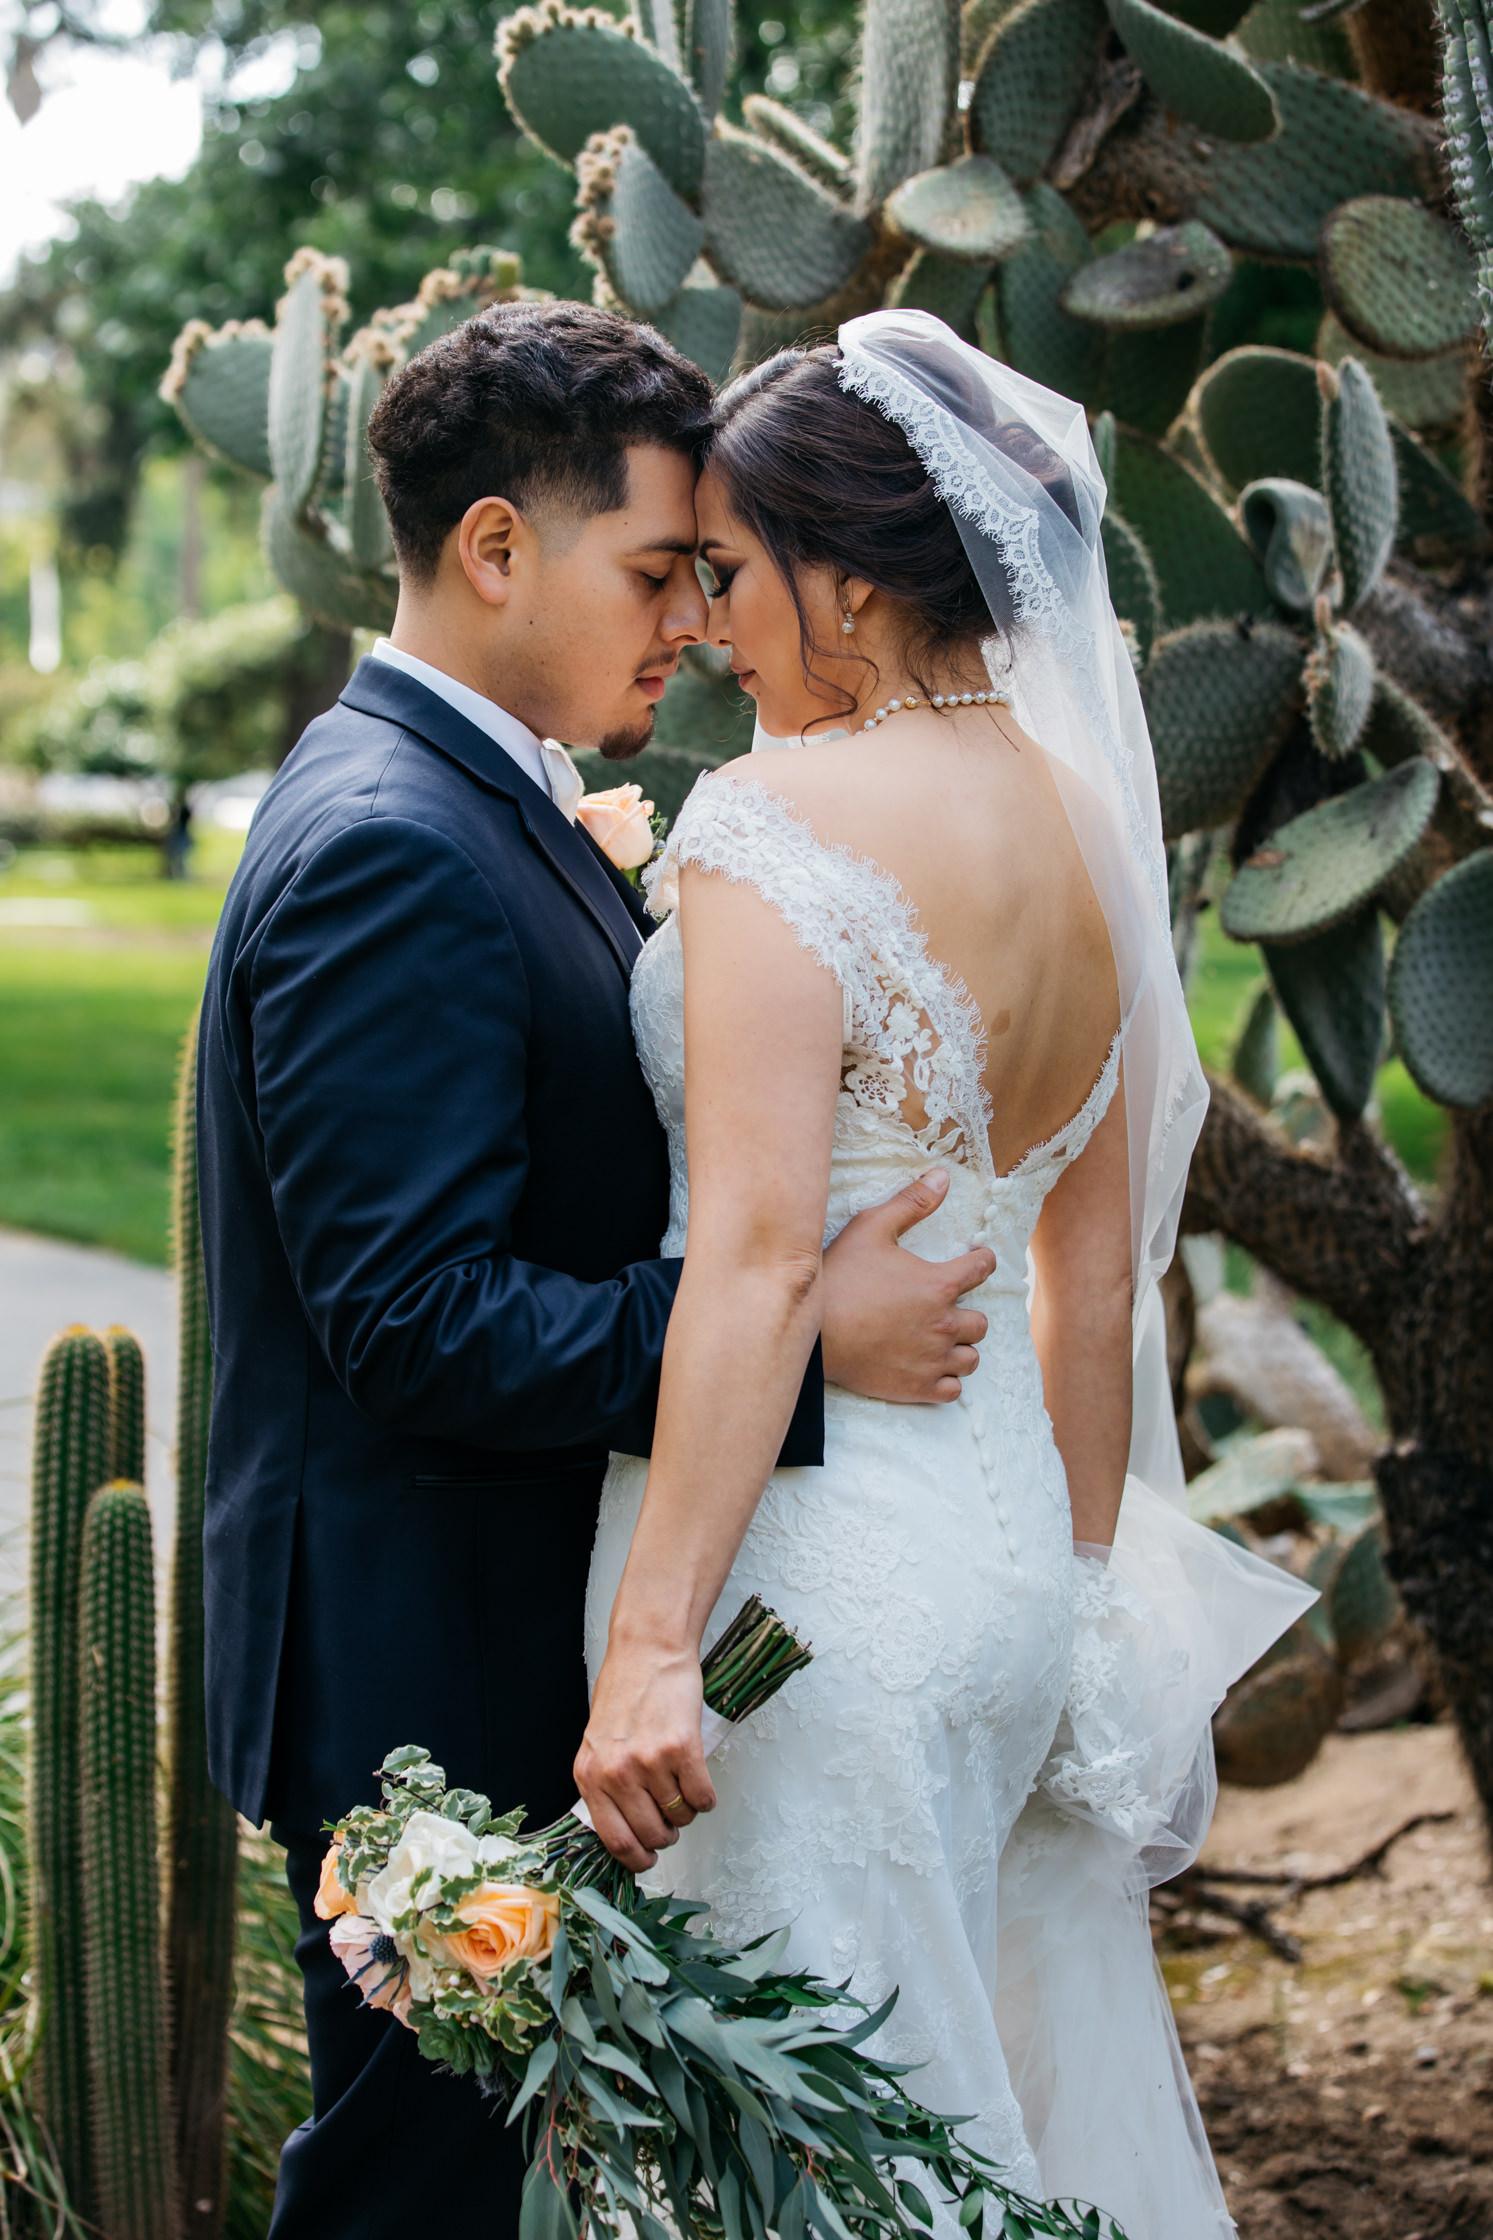 luis_joanna_wedding-54.jpg